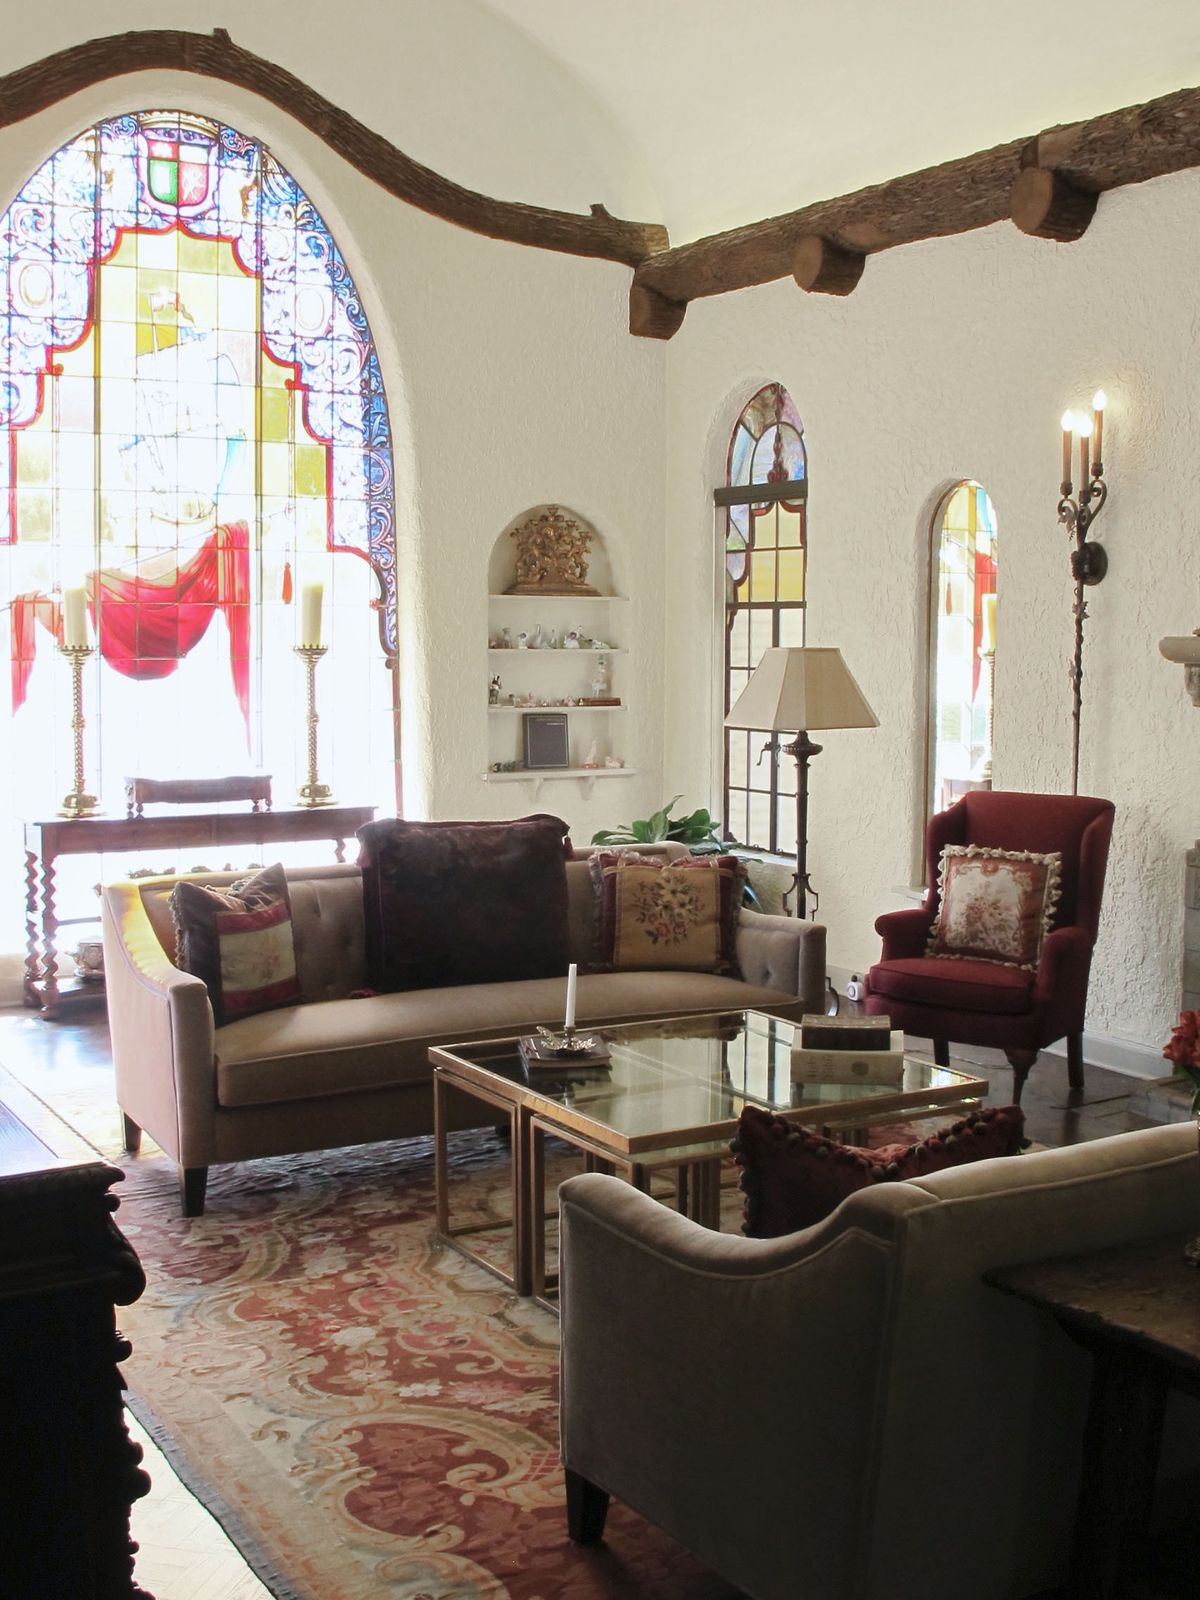 Historic Hutsell Mediterranean Home Photo Video Shoot Location 13.jpg